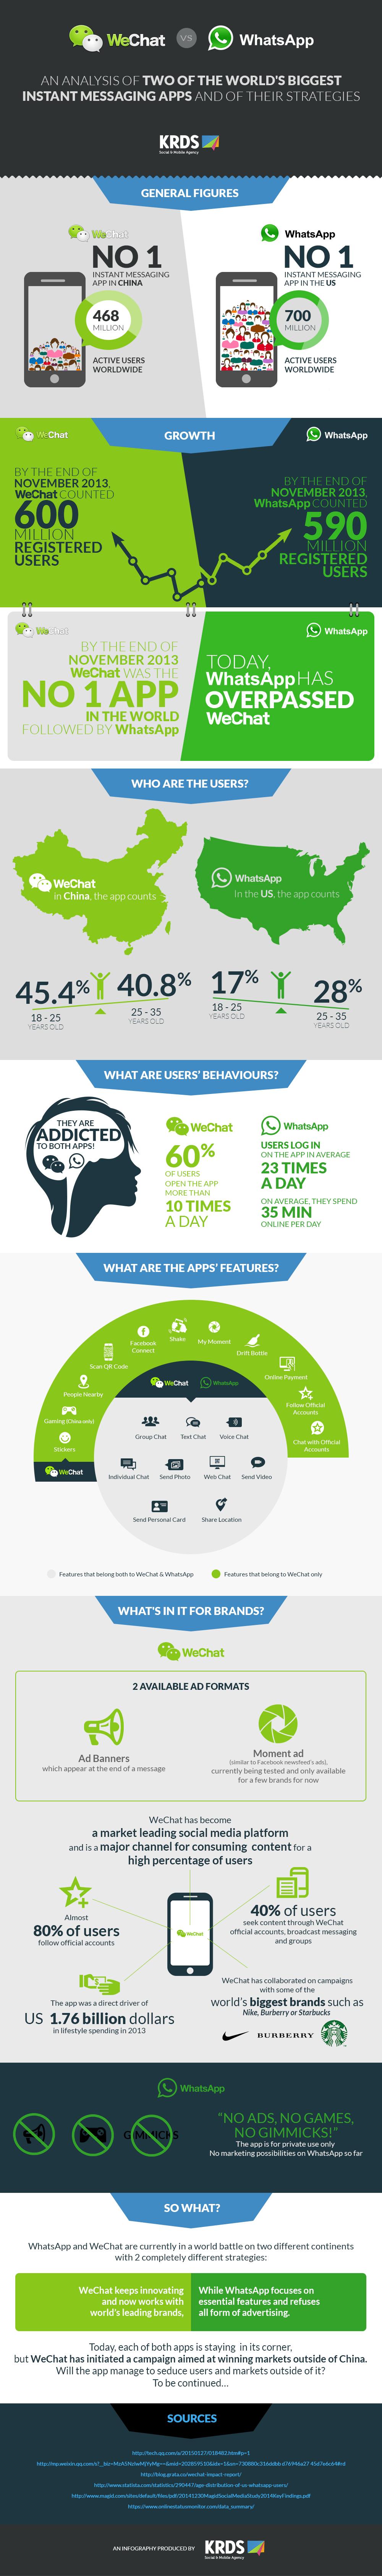 Infographic WeChat vs Whatsapp